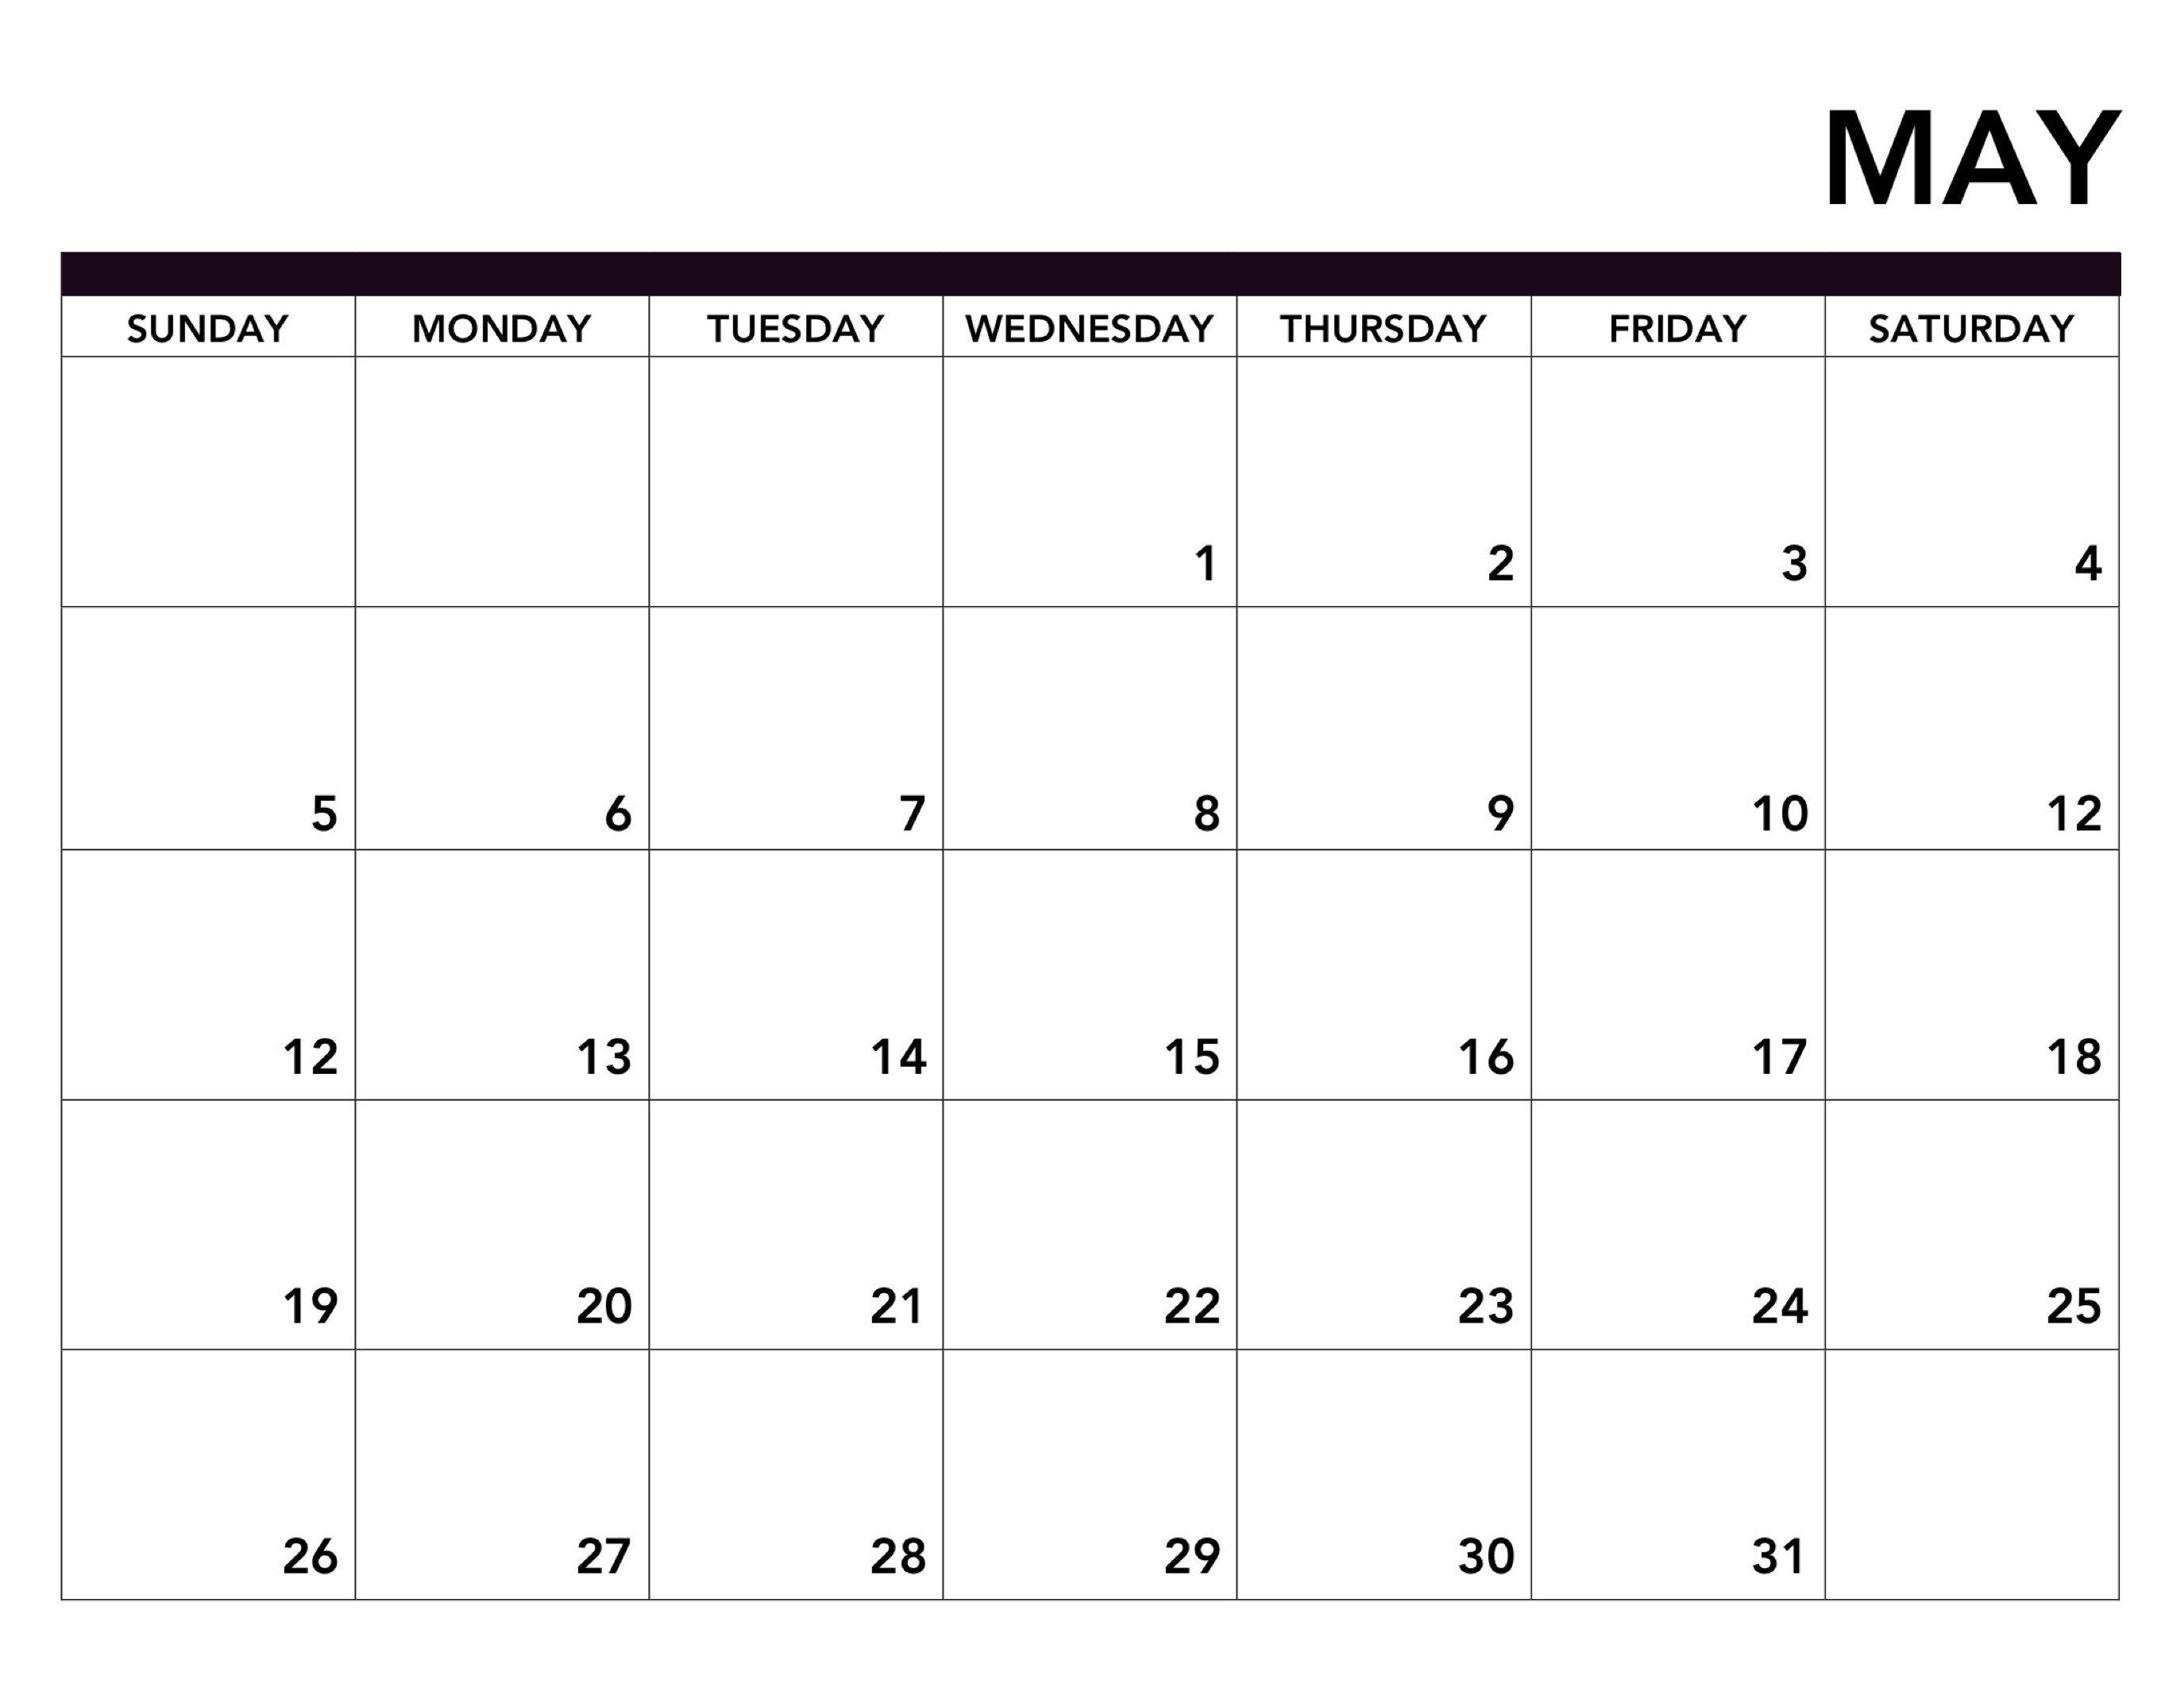 2019 Printable Calendar Free Pages - Paper Trail Design Calendar 2019 July August